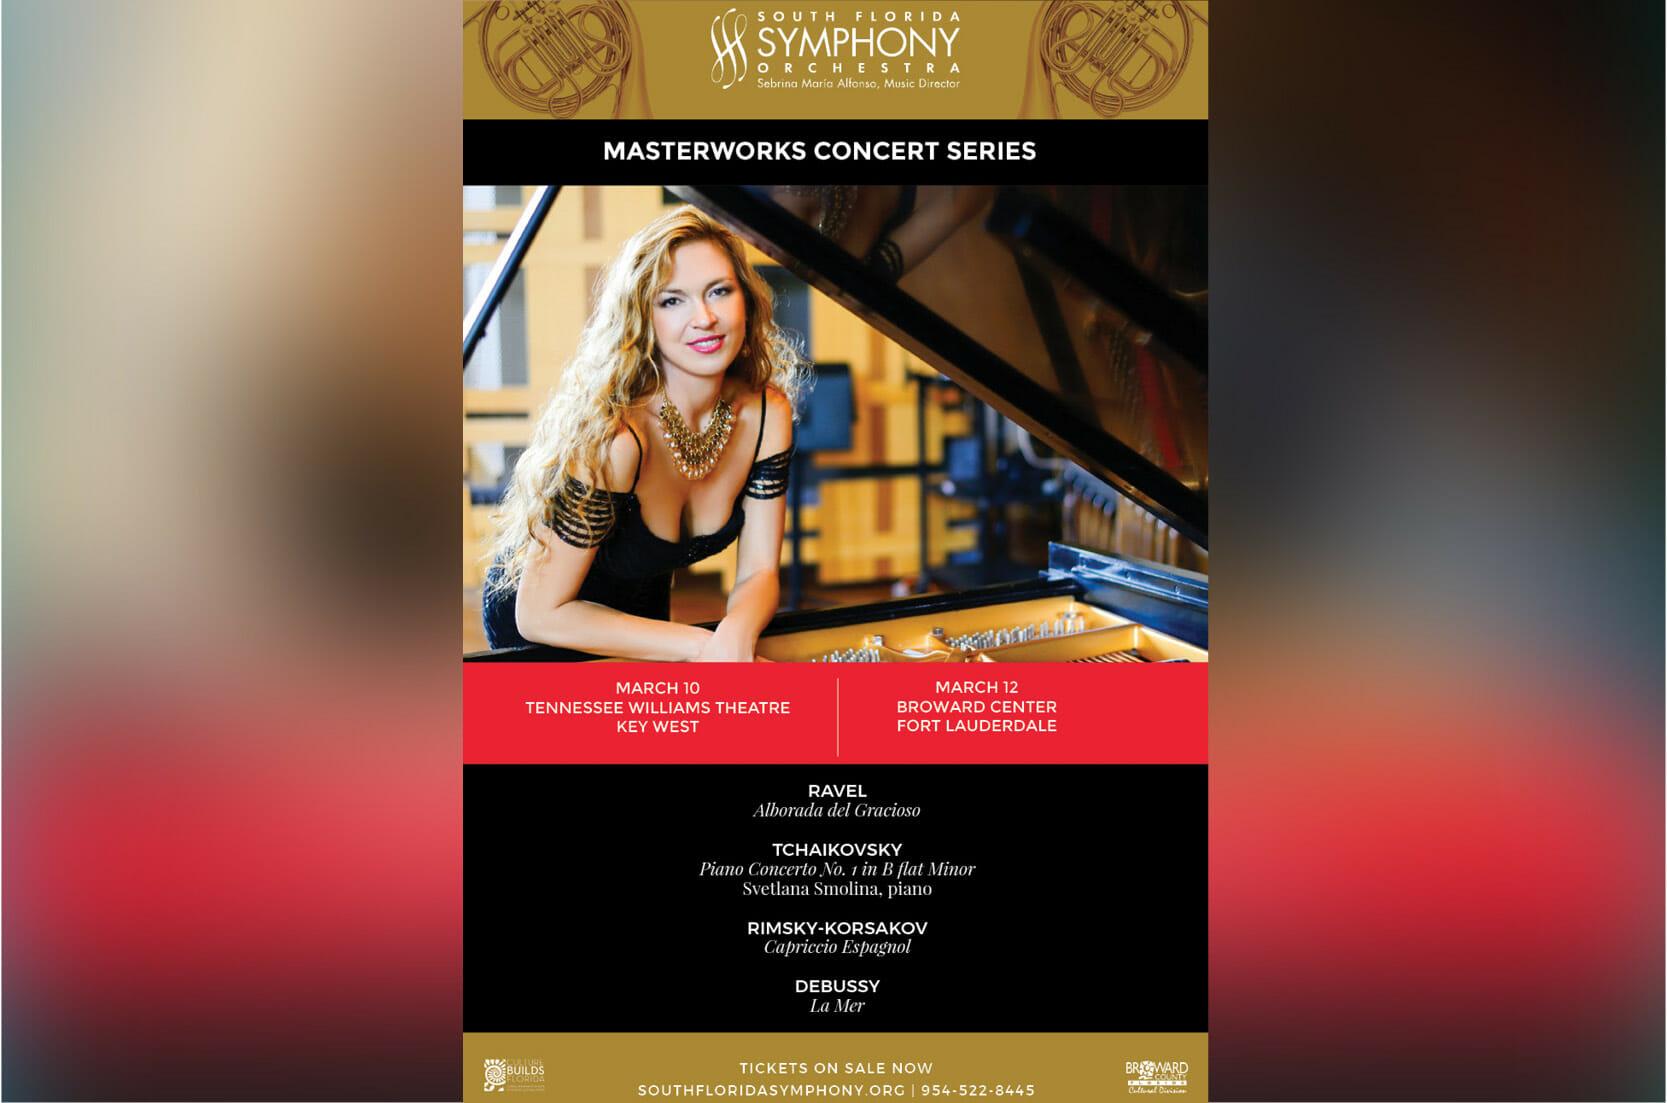 Svetlana Smolina's Return to the South Florida Symphony Orchestra